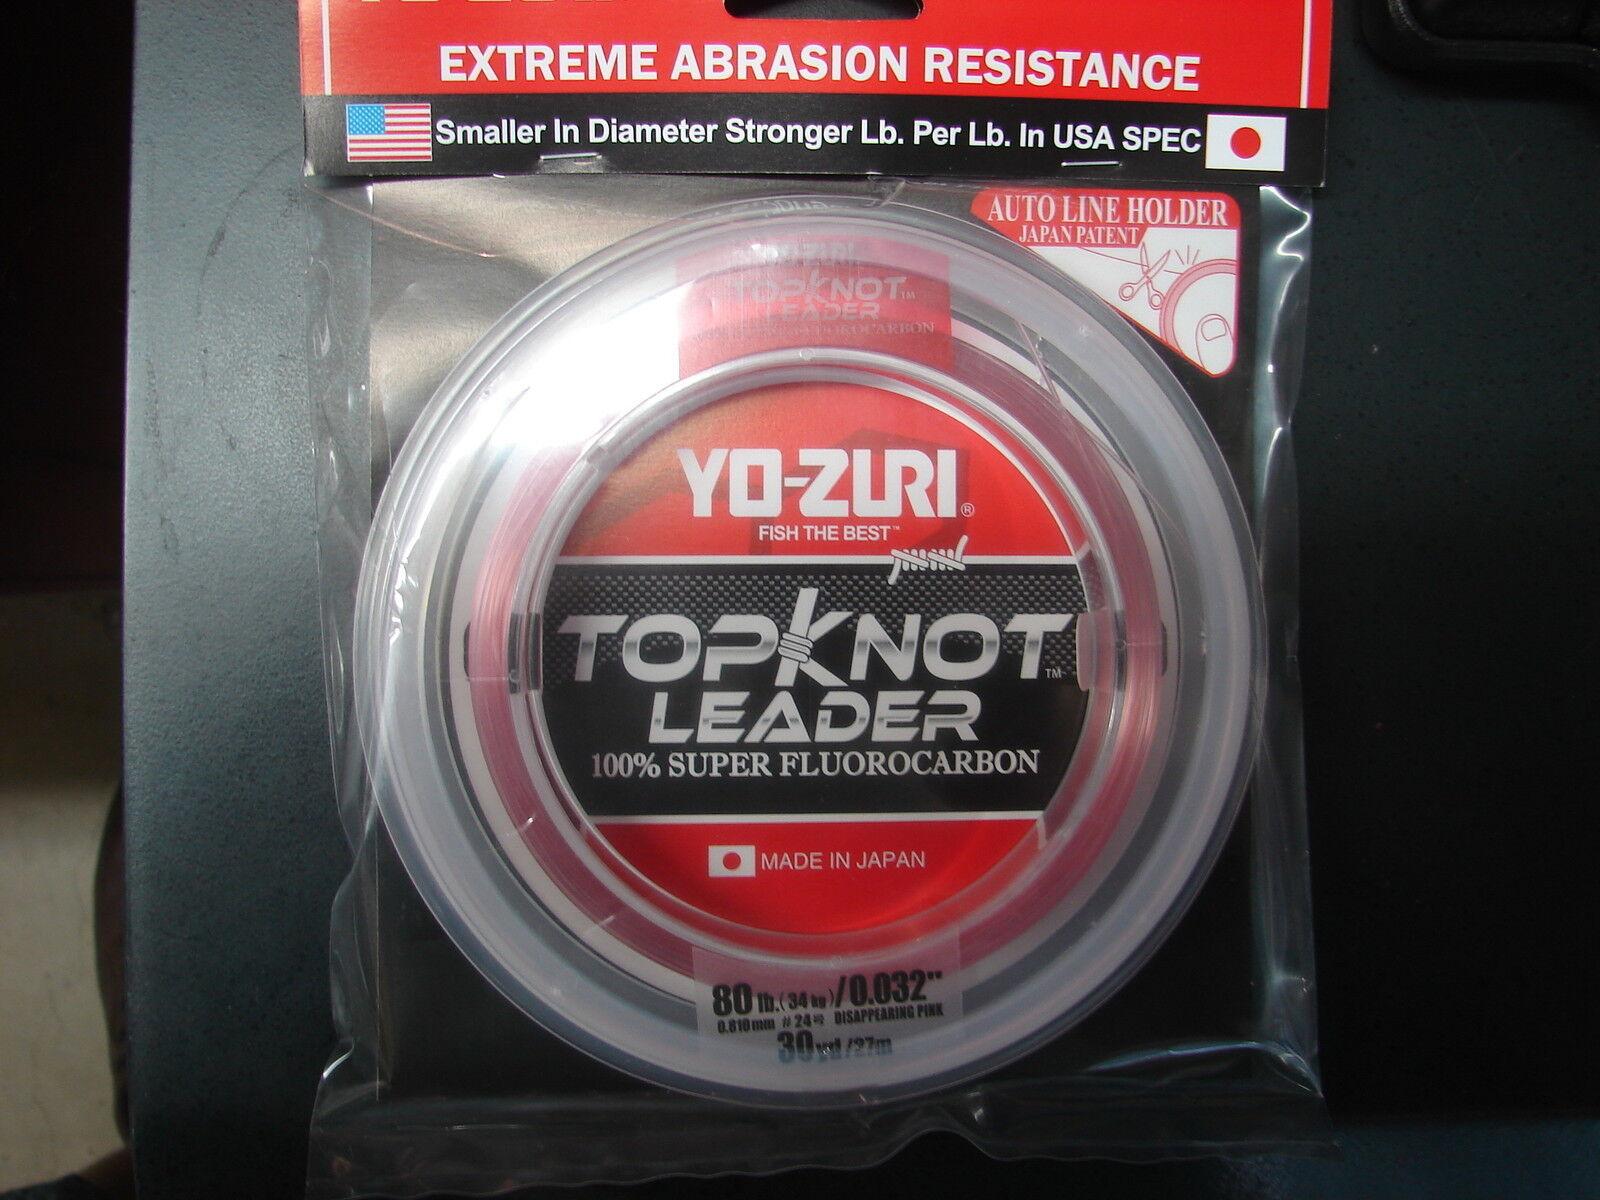 YO-ZURI TOPKNOT LEADER SUPER FLUgoldCARBON 80lb 30yd R1235-DP Disappearing Pink